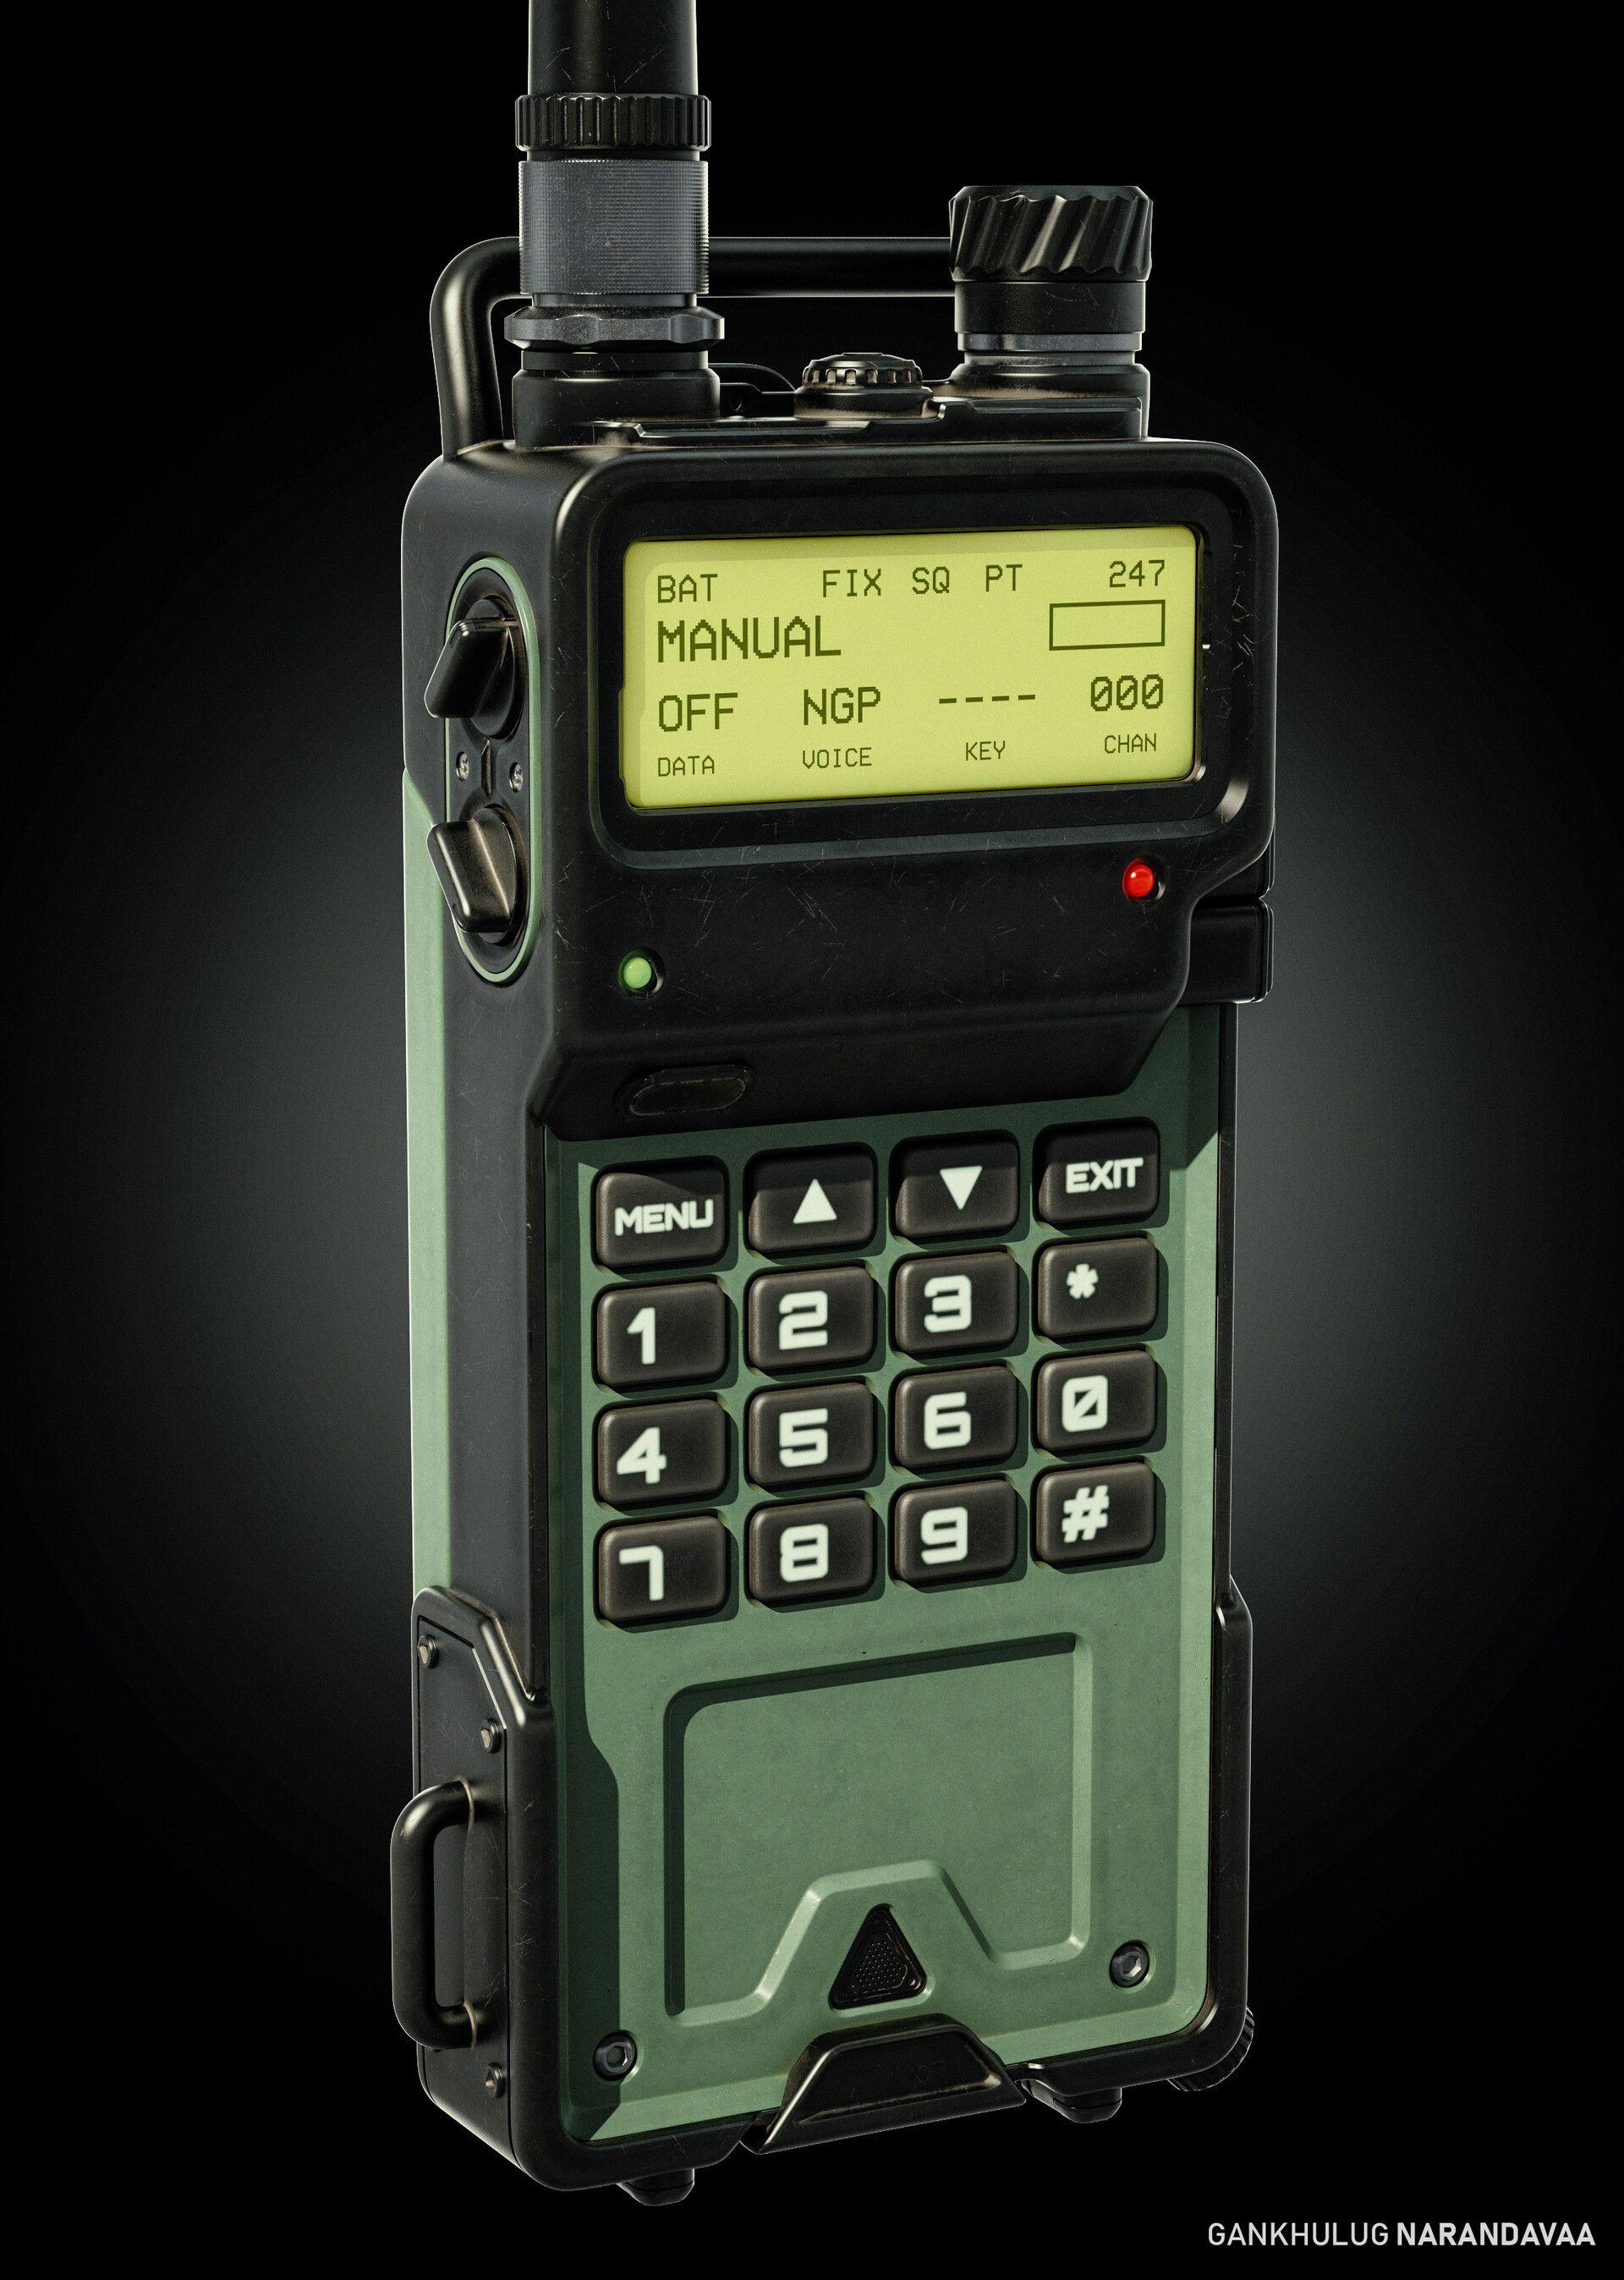 ArtStation Tactical Radio Device, Gankhulug Narandavaa